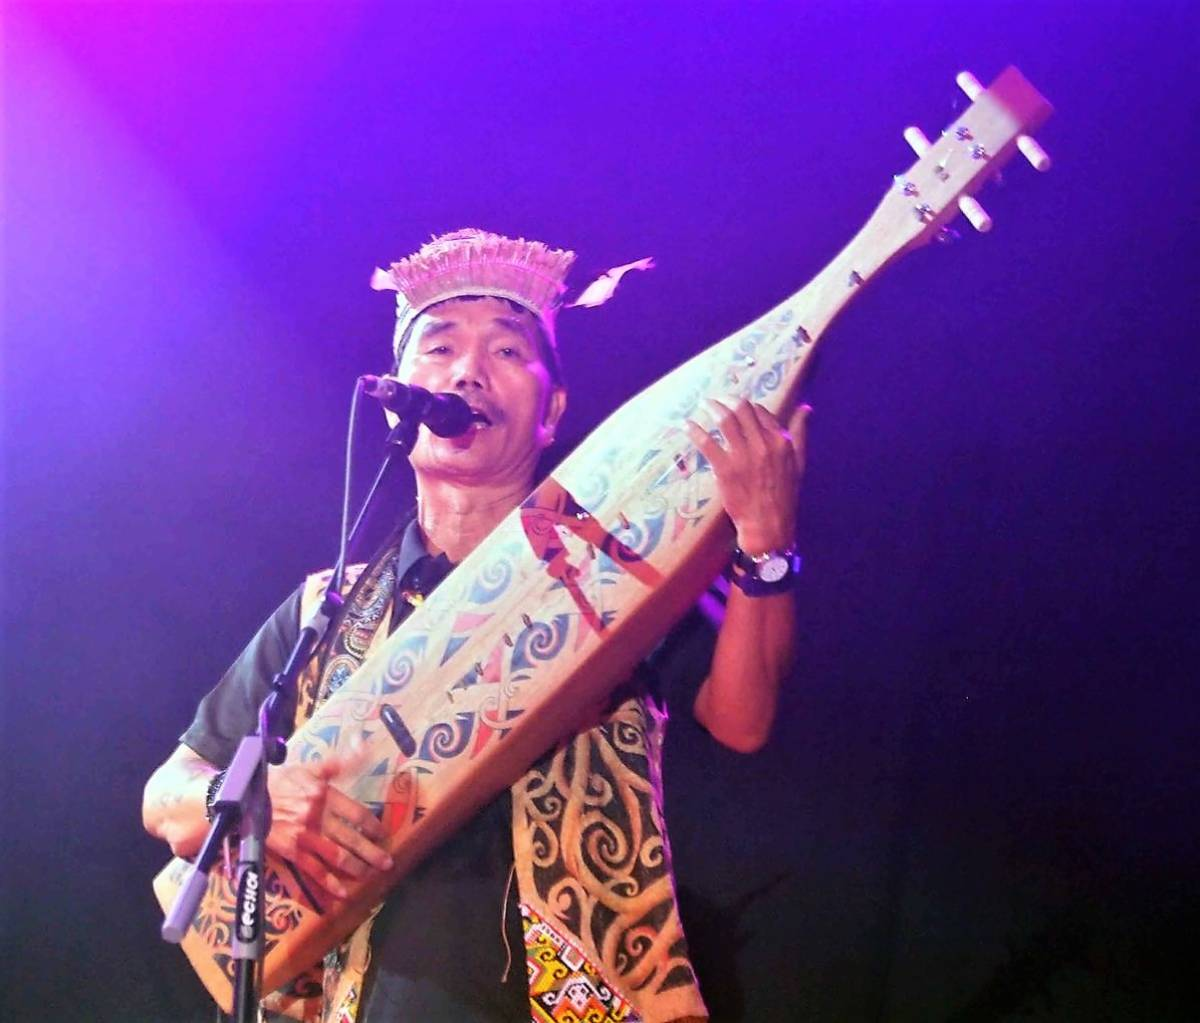 Sarawakian Groups will Perform Live at Rainforest World Music Festival June 18-20, 2021